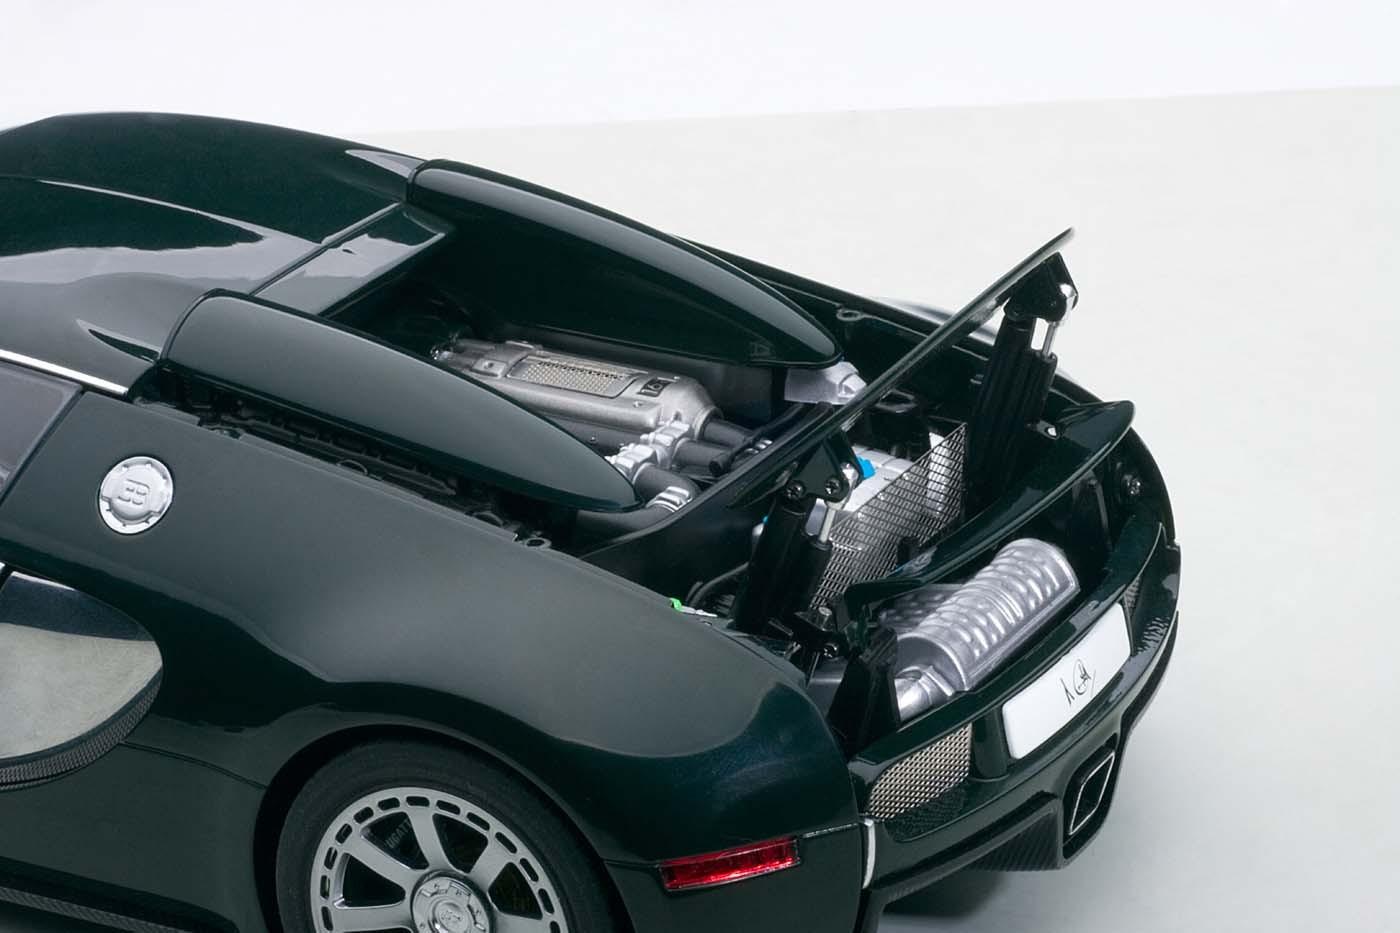 highly detailed autoart die-cast model green/chrome bugatti veyron